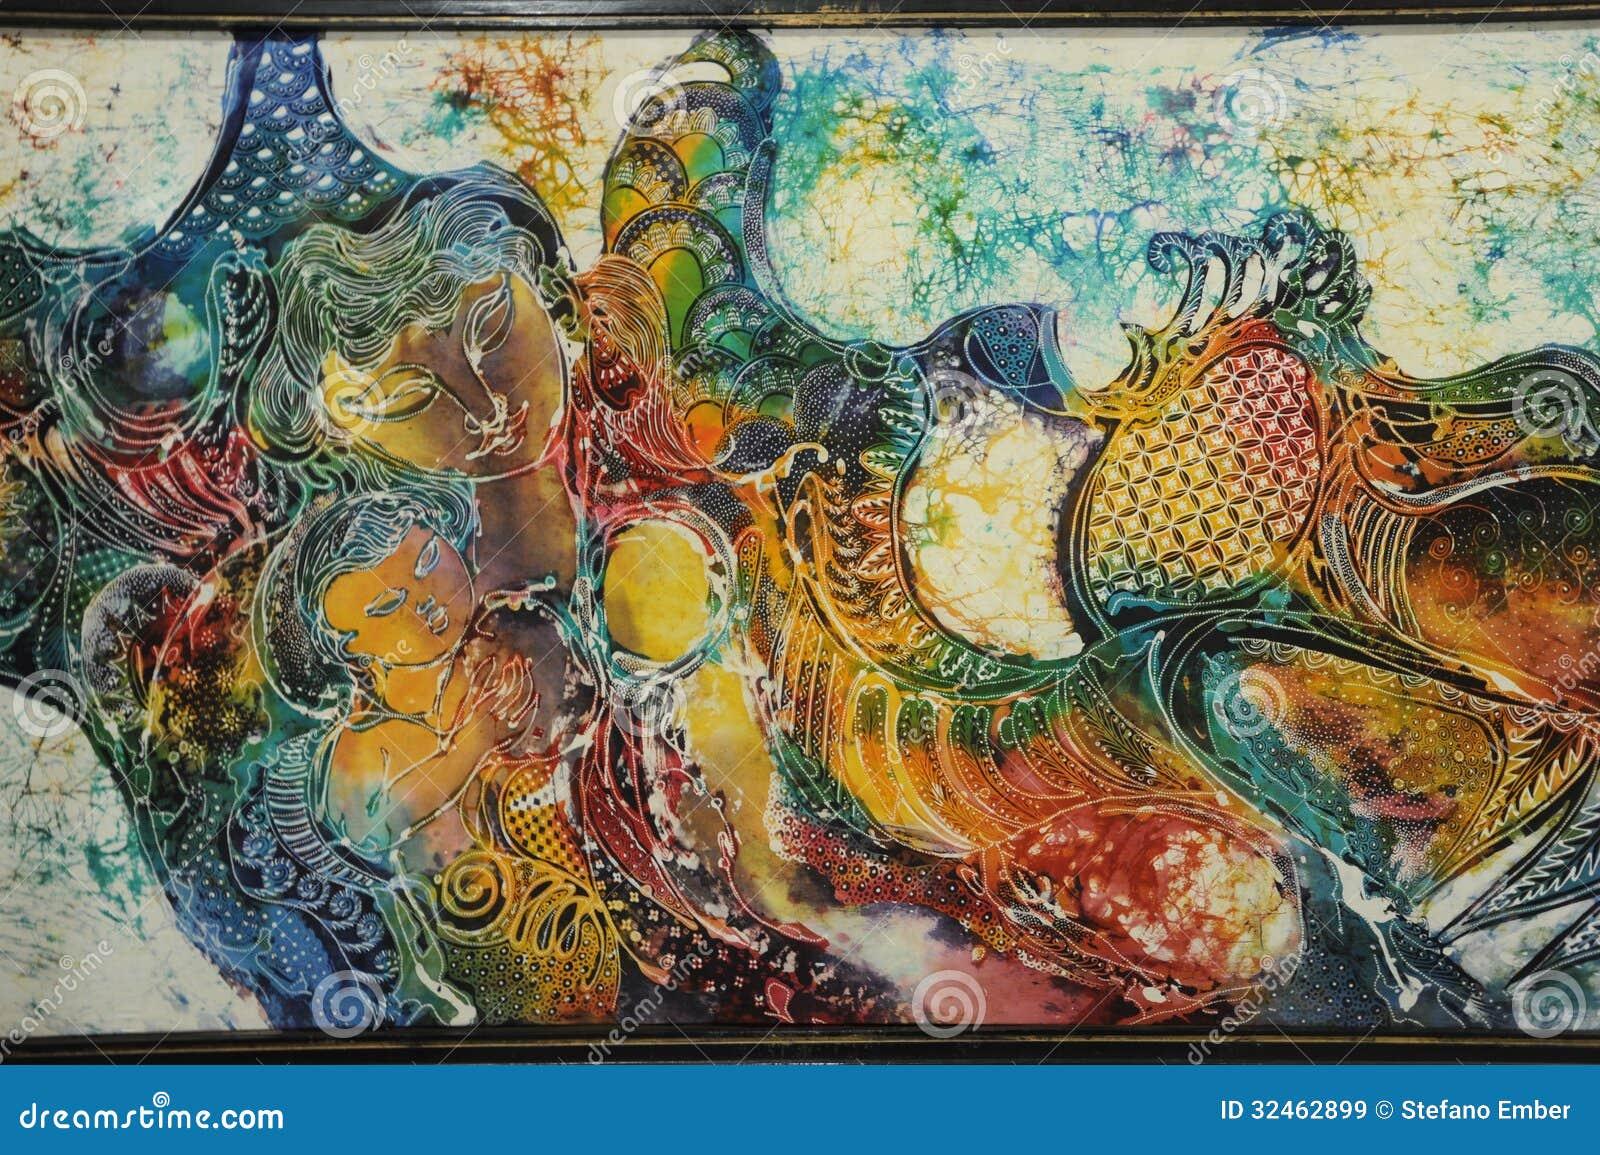 Batik Art Work Of Yogyakarta Royalty Free Stock Images - Image ...